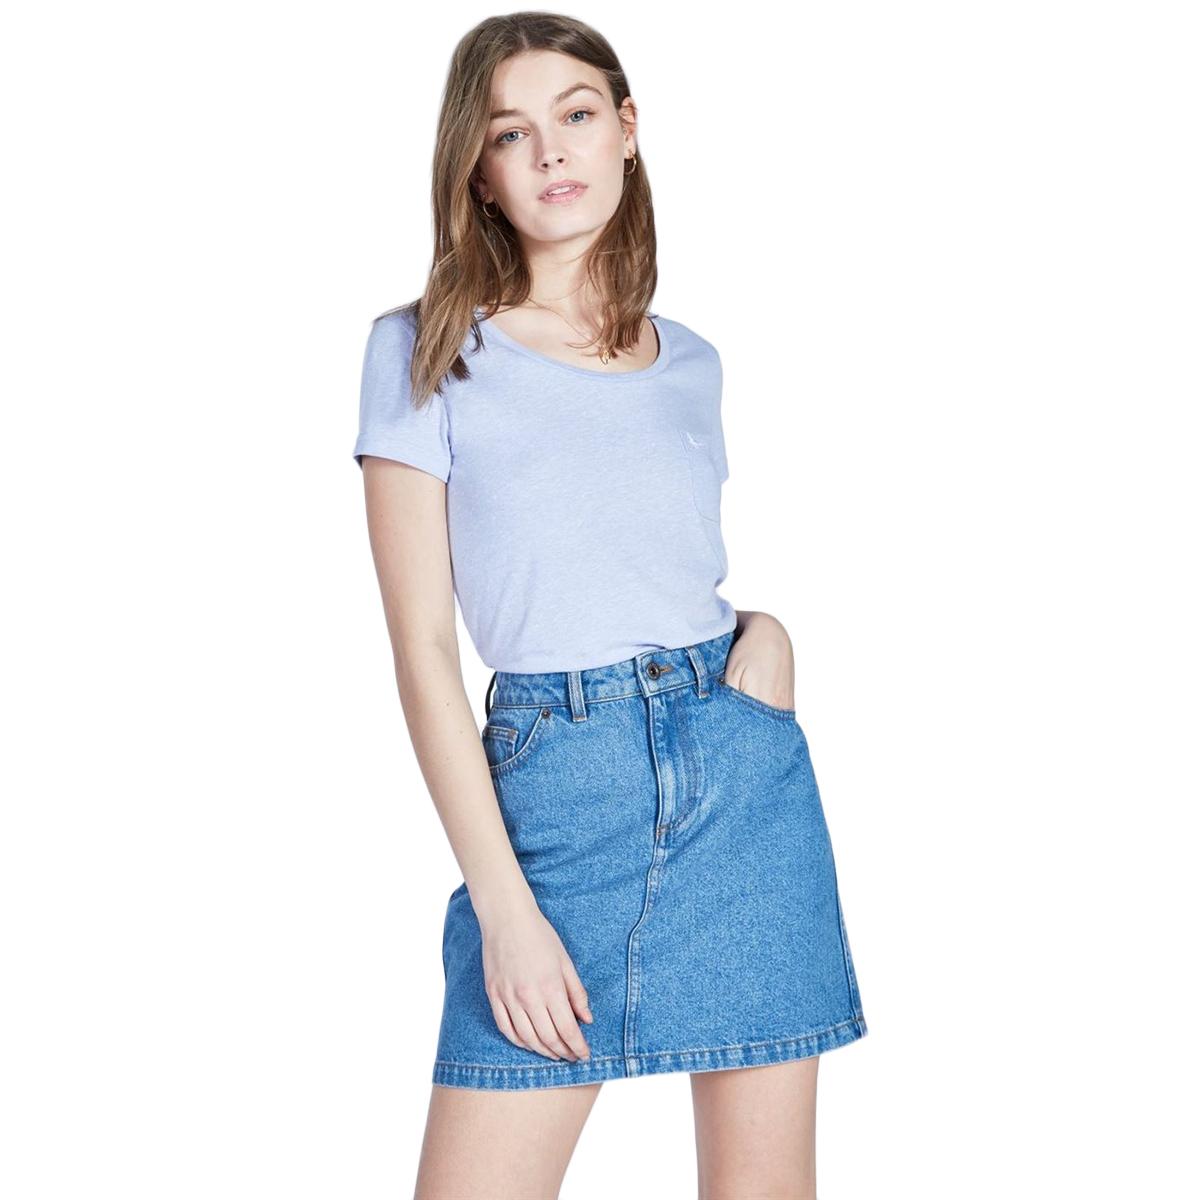 Jack Wills Women's Fullford Short-Sleeve Tee - Blue, 6